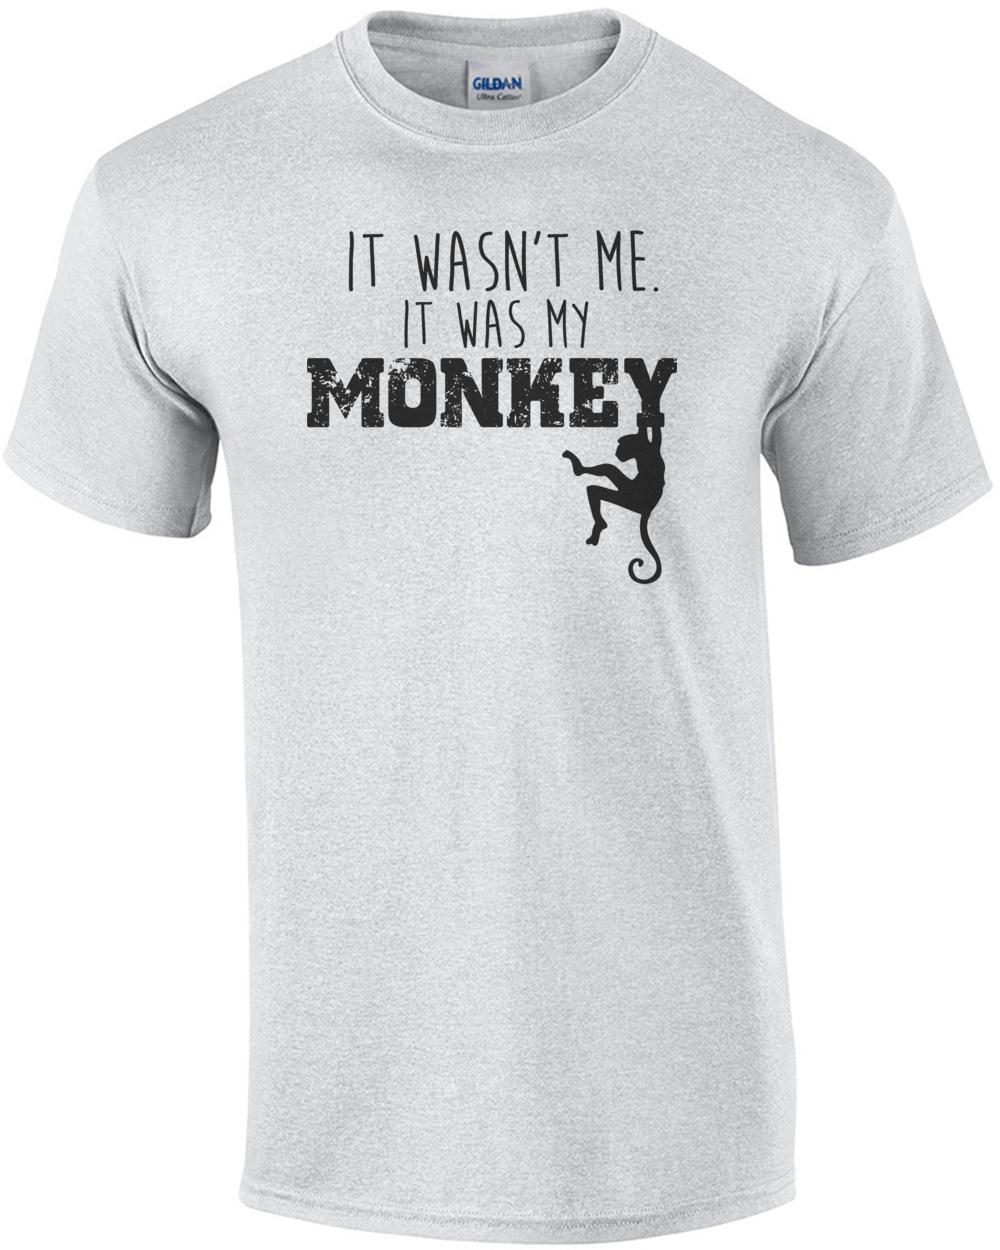 be8f920091cc9 it-wasnt-me-it-was-my-monkey-funny-tshirt-mens-regular-ash.jpg